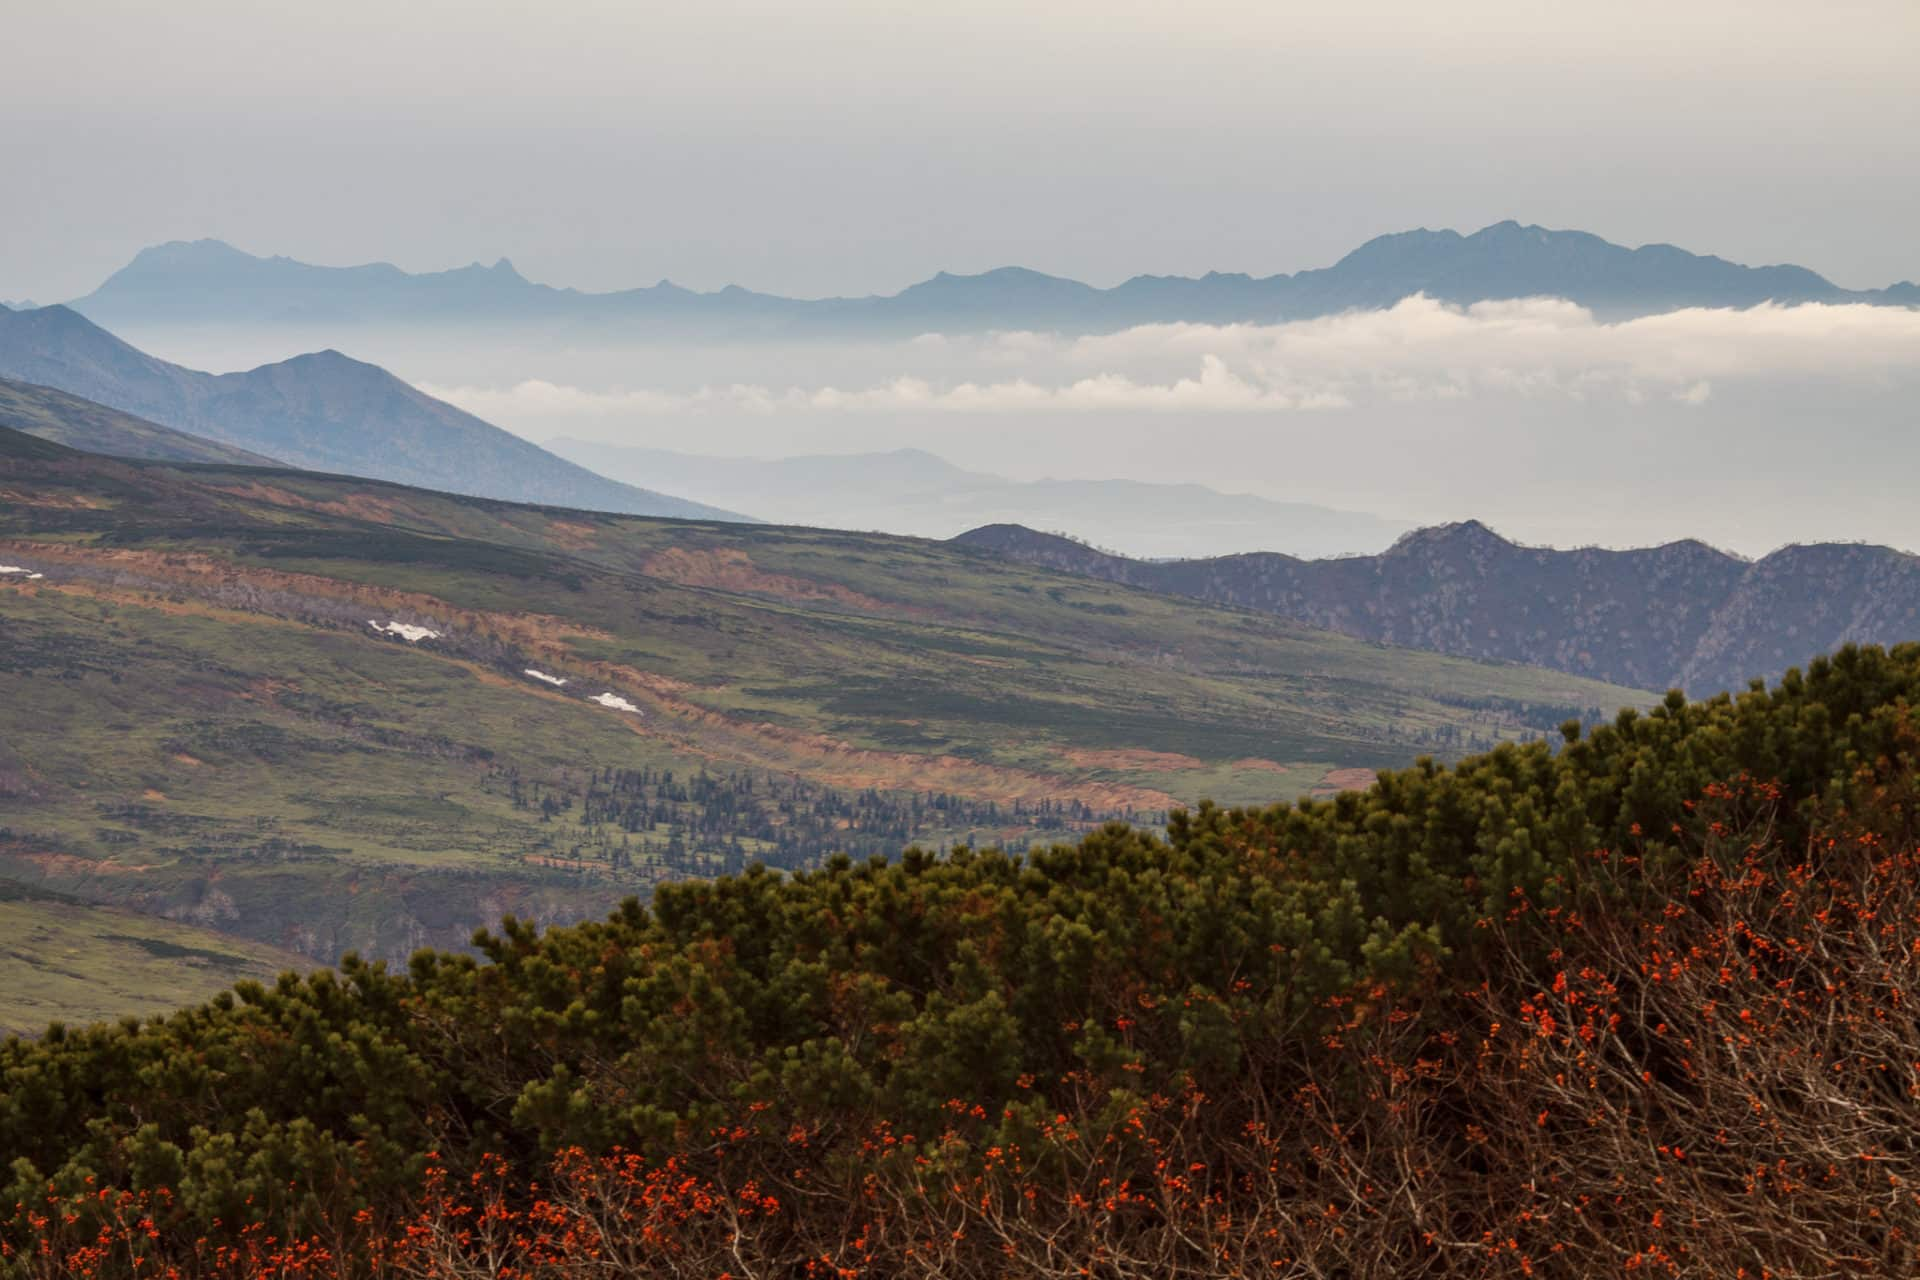 4-day hiking in Daisetsuzan from Asahidake to Tomuraushi